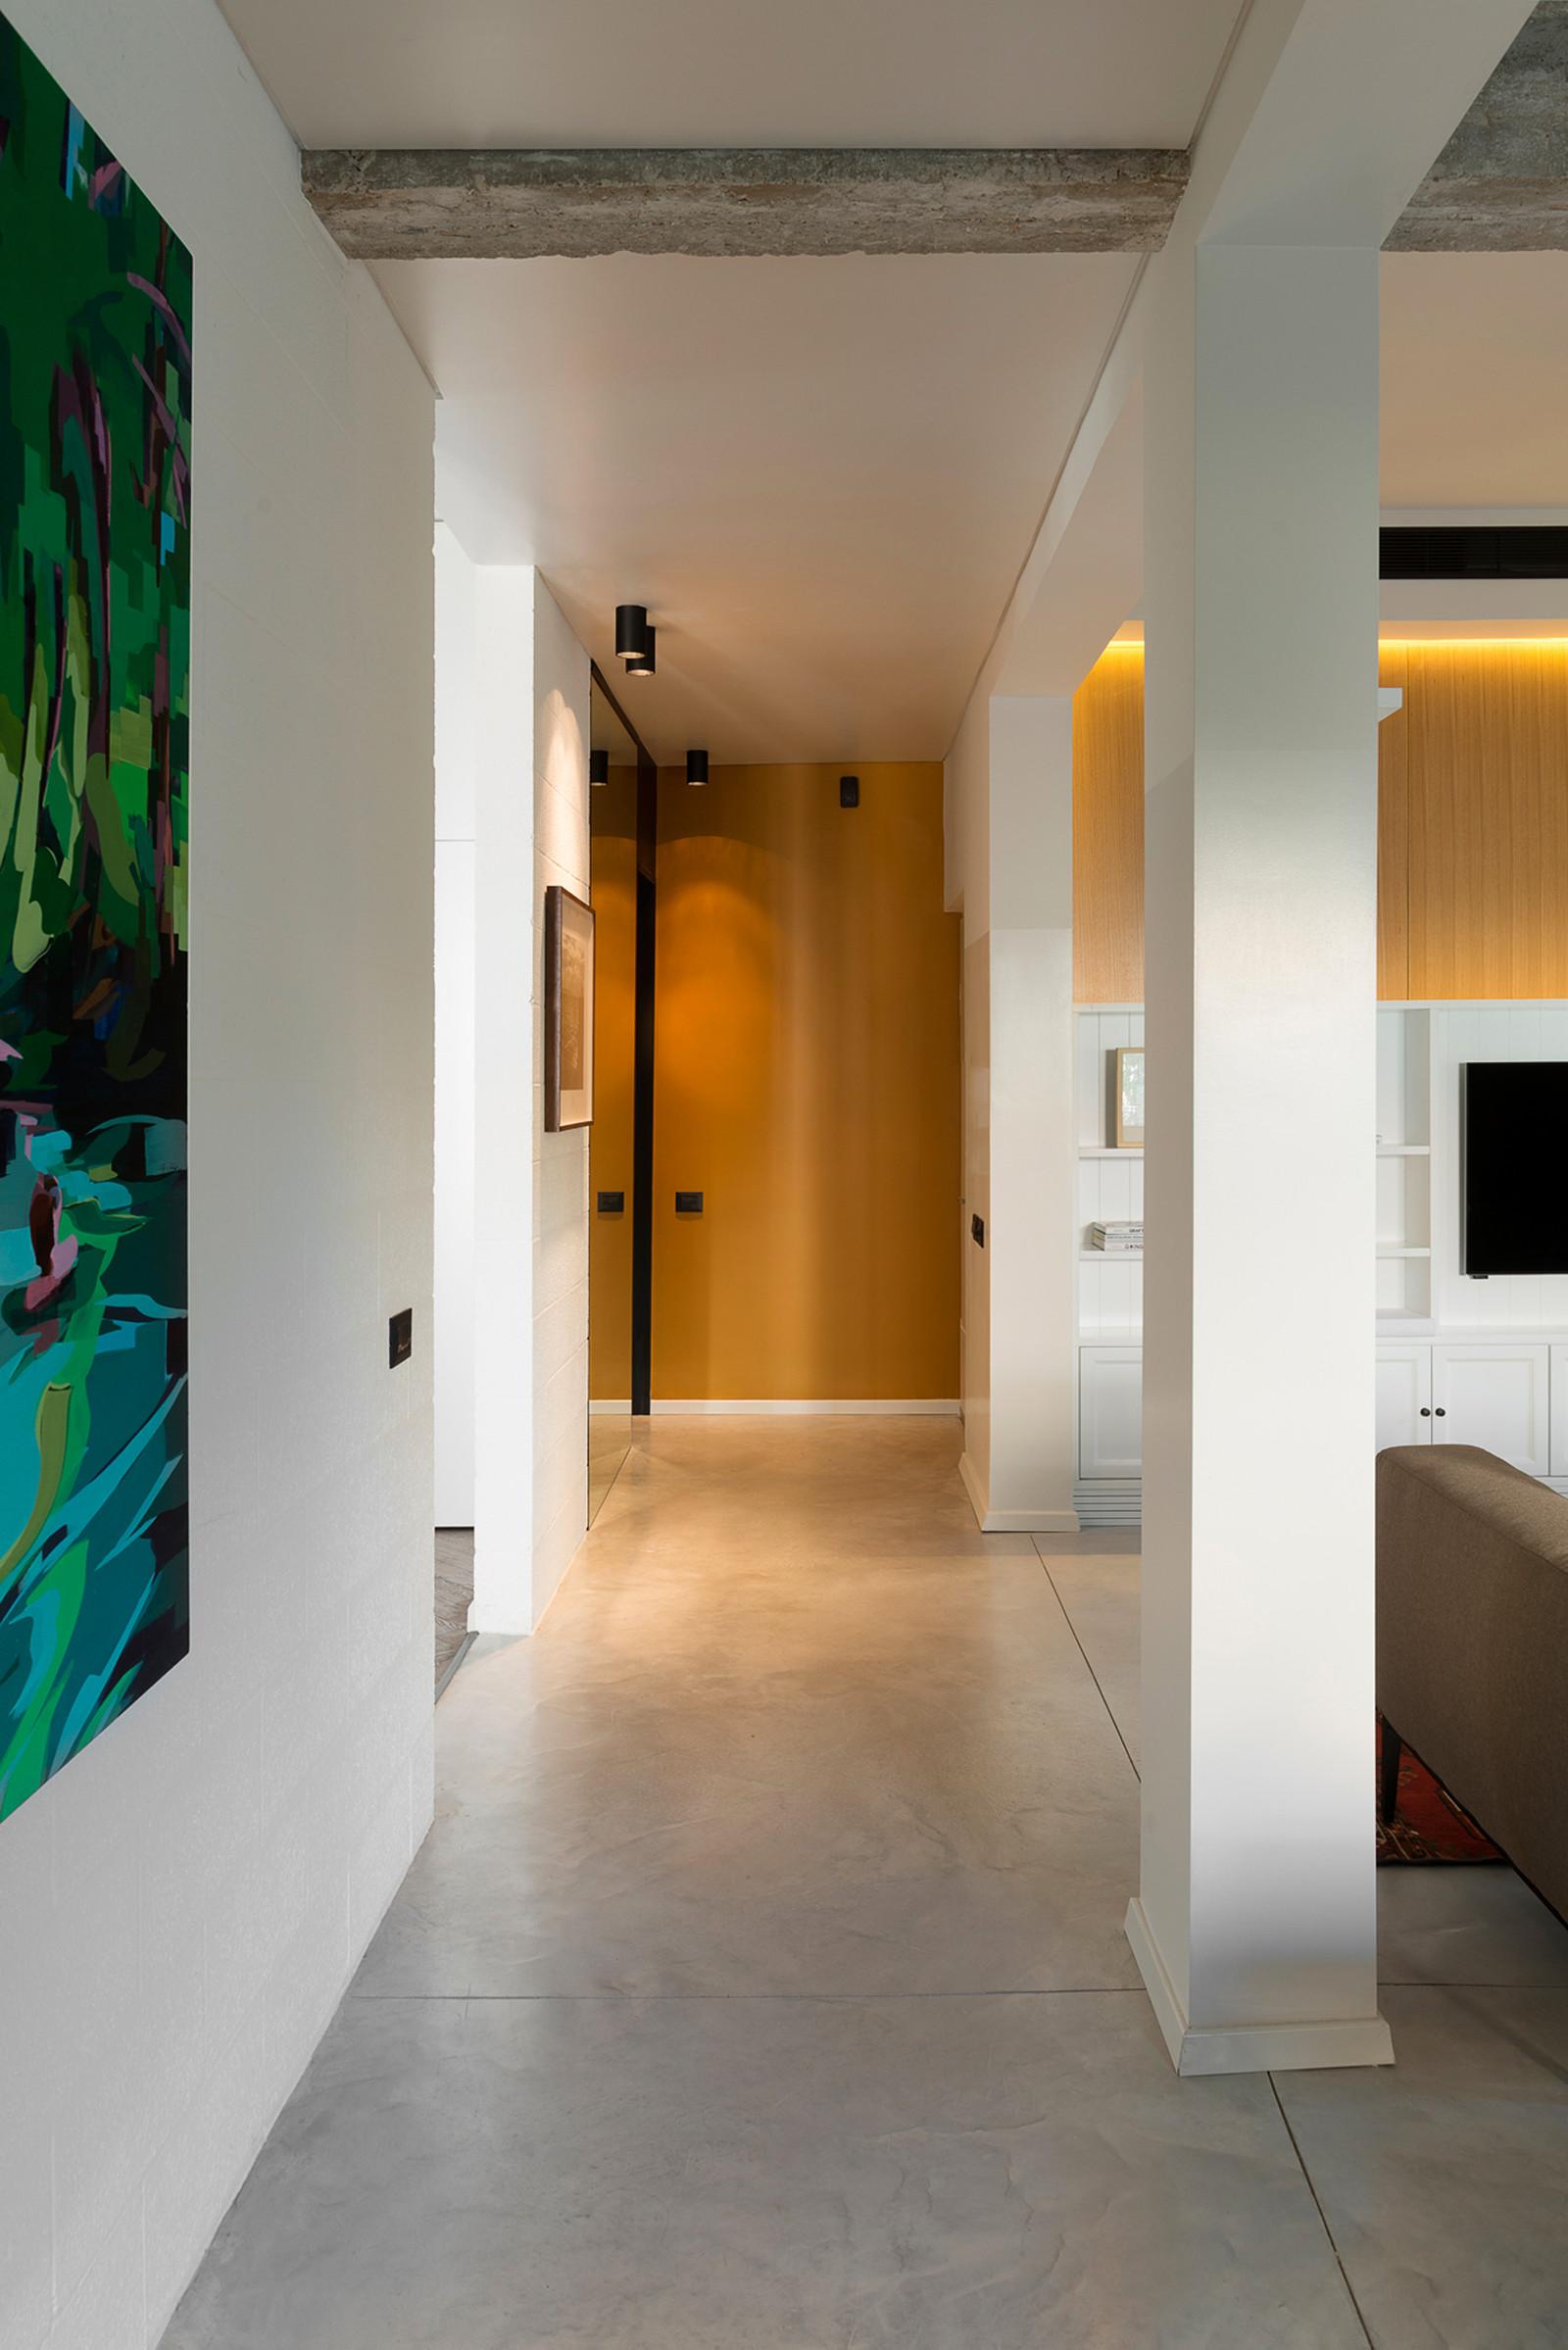 Apartment-renovation-just3ds.com-12